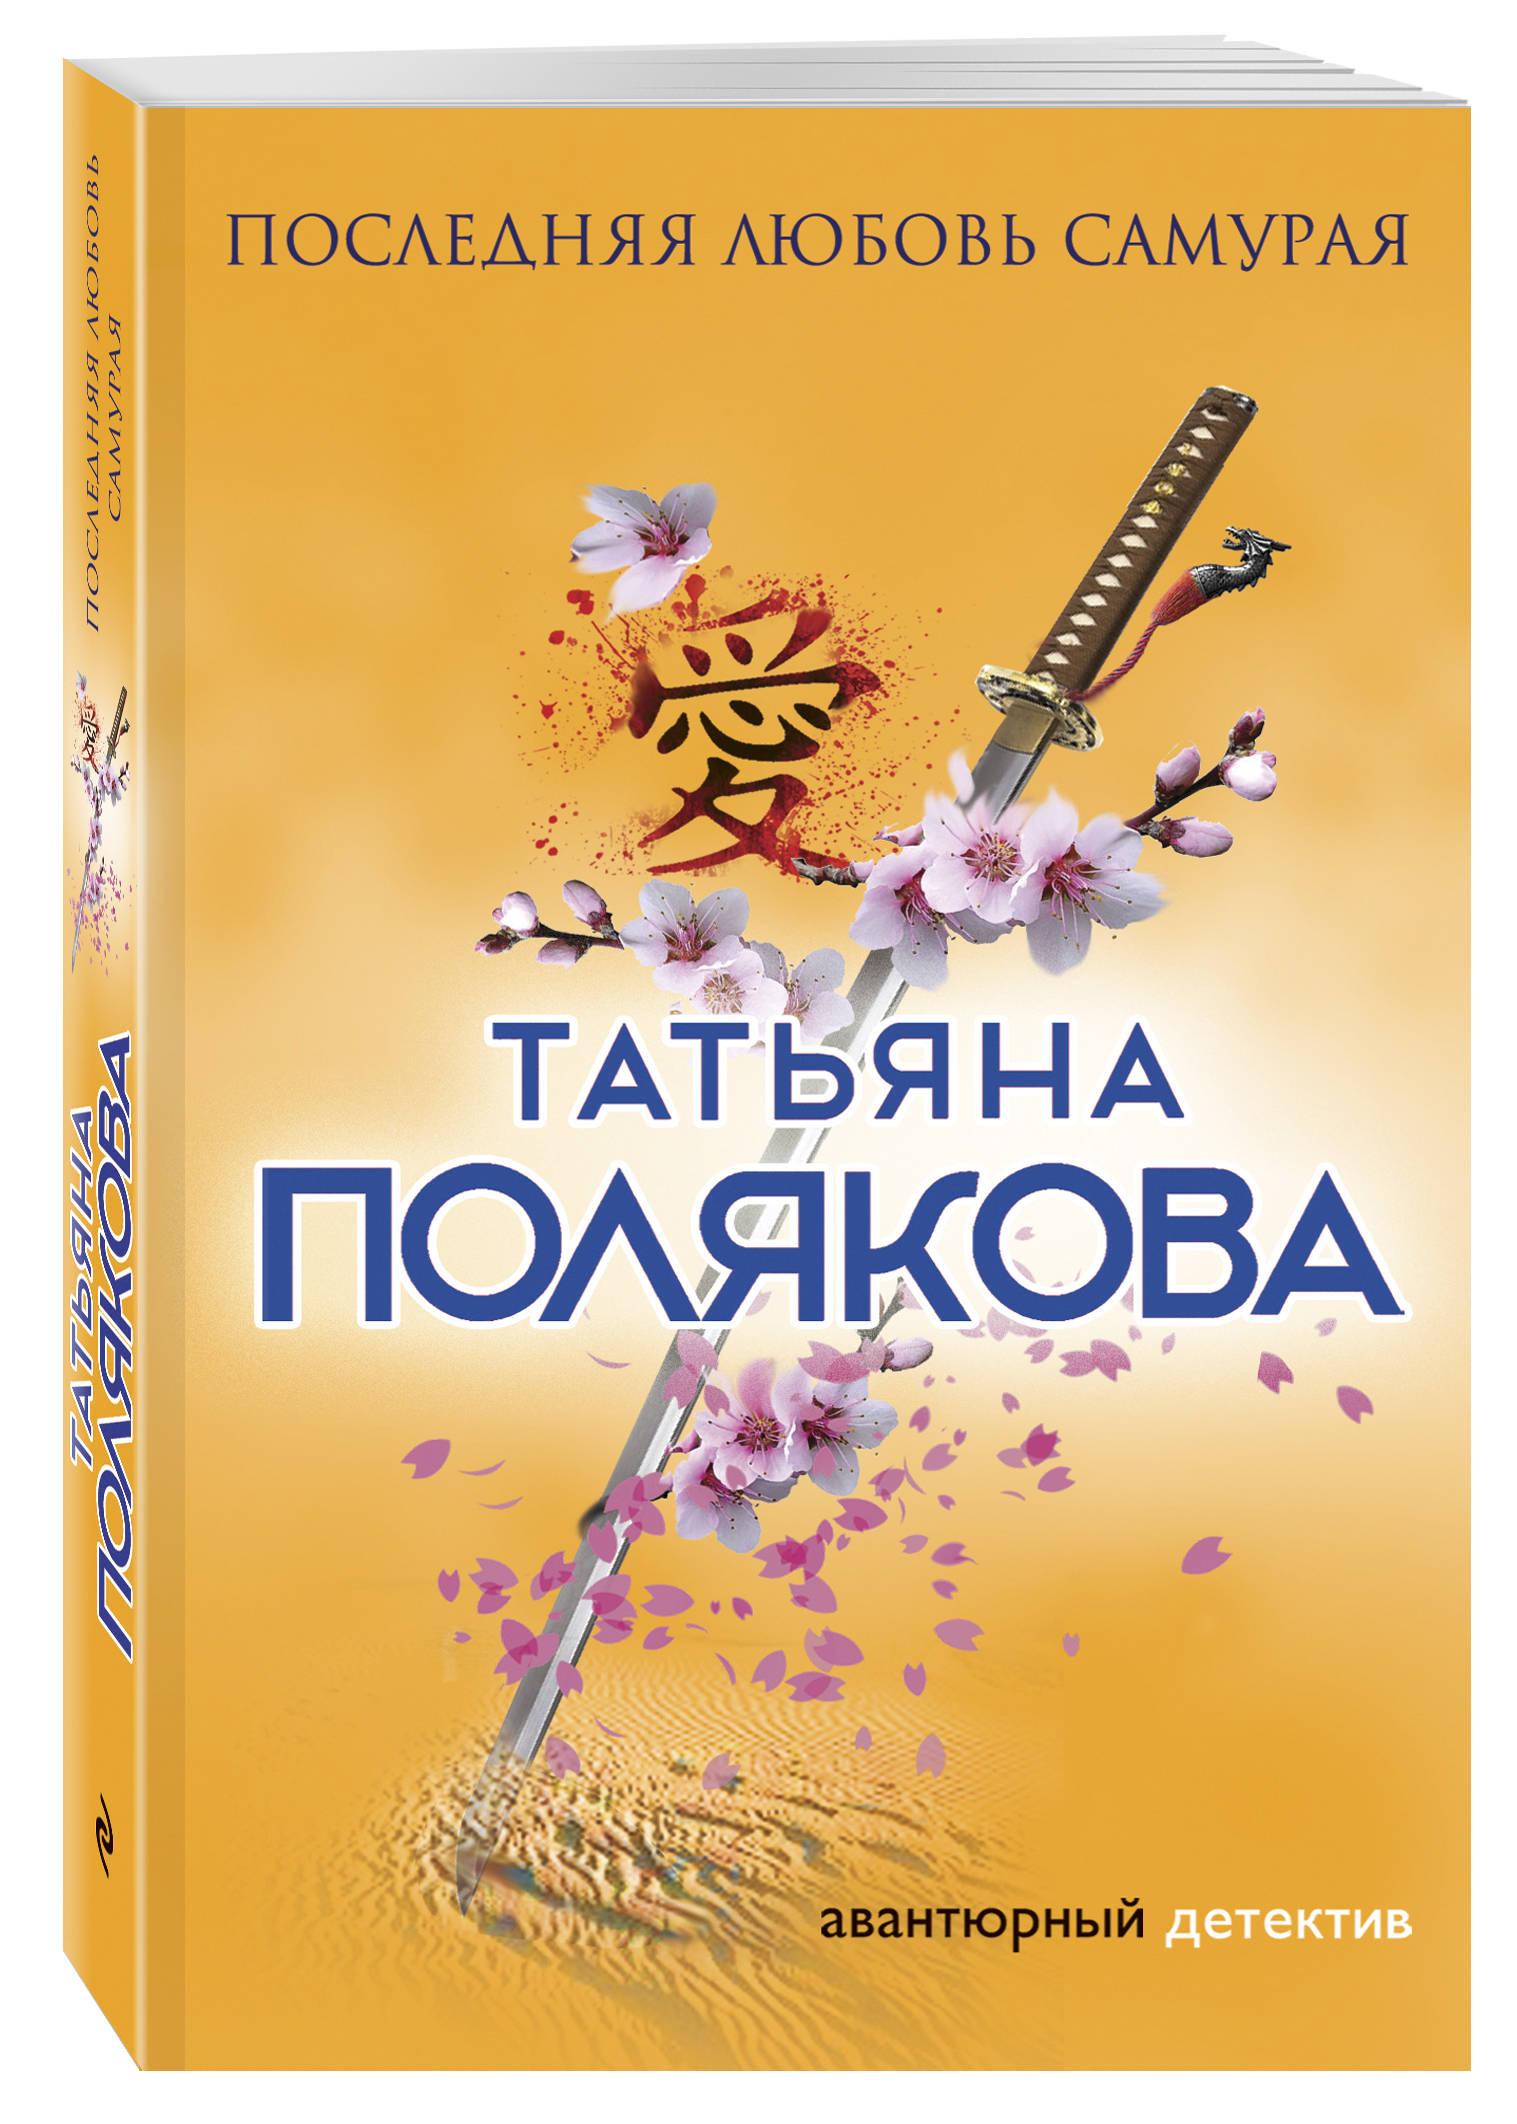 Татьяна Полякова Последняя любовь Самурая